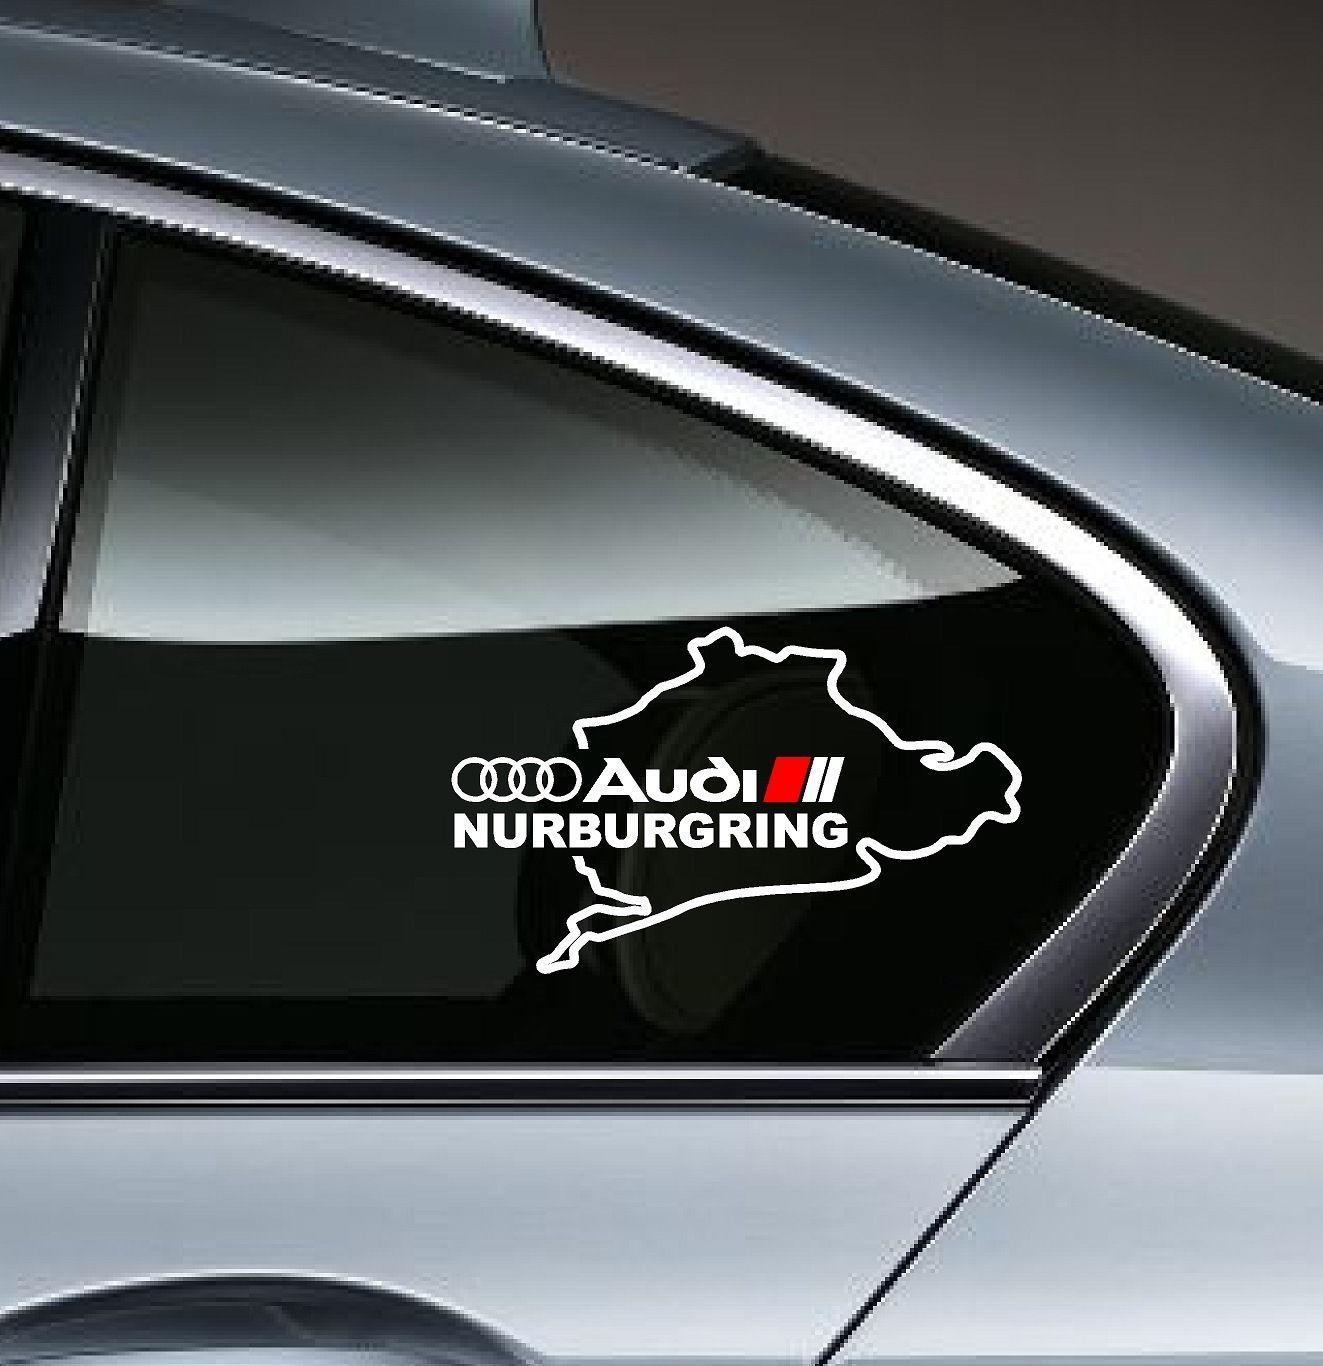 2 AUDI NURBURGRING A8 Q3 Q5 Q7 TT RS3 RS4 Decal Sticker